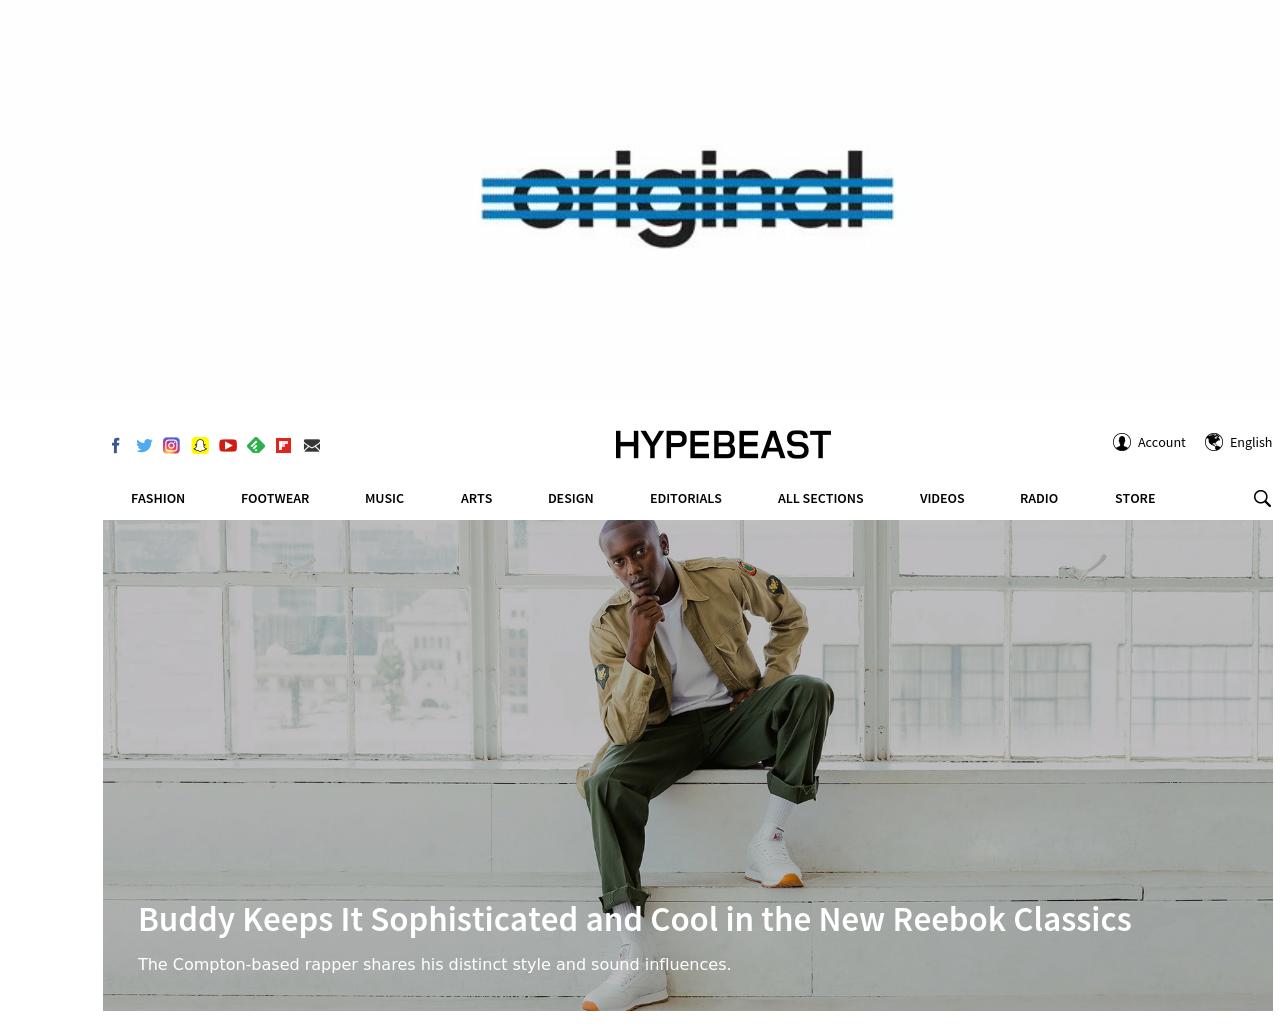 Hypebeast-Advertising-Reviews-Pricing